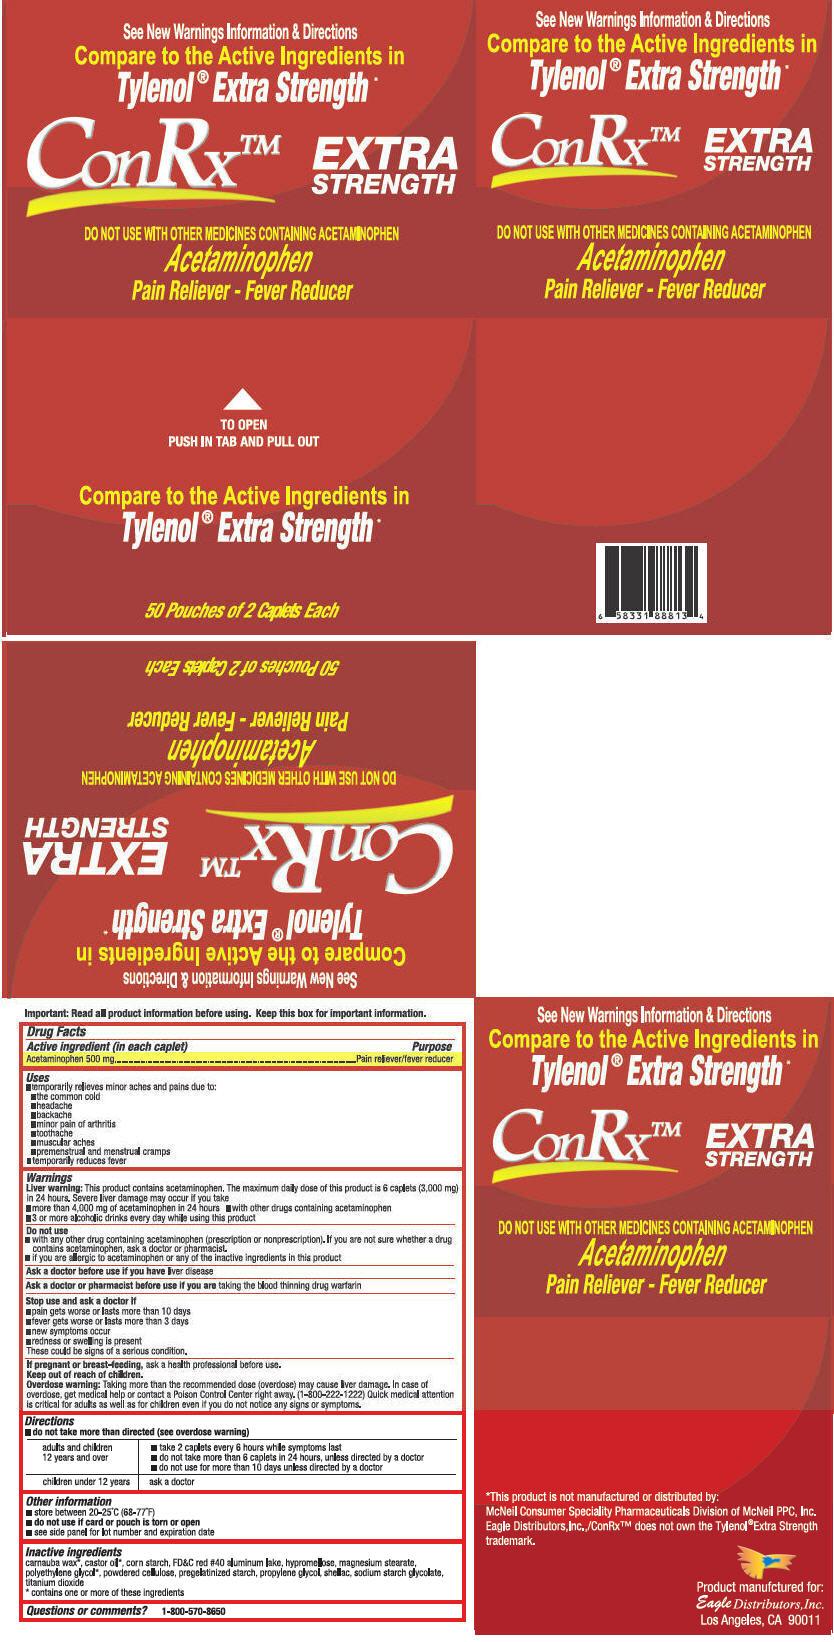 Conrx Extra Strength (Acetaminophen) Tablet [Eagle Distributors,inc.]